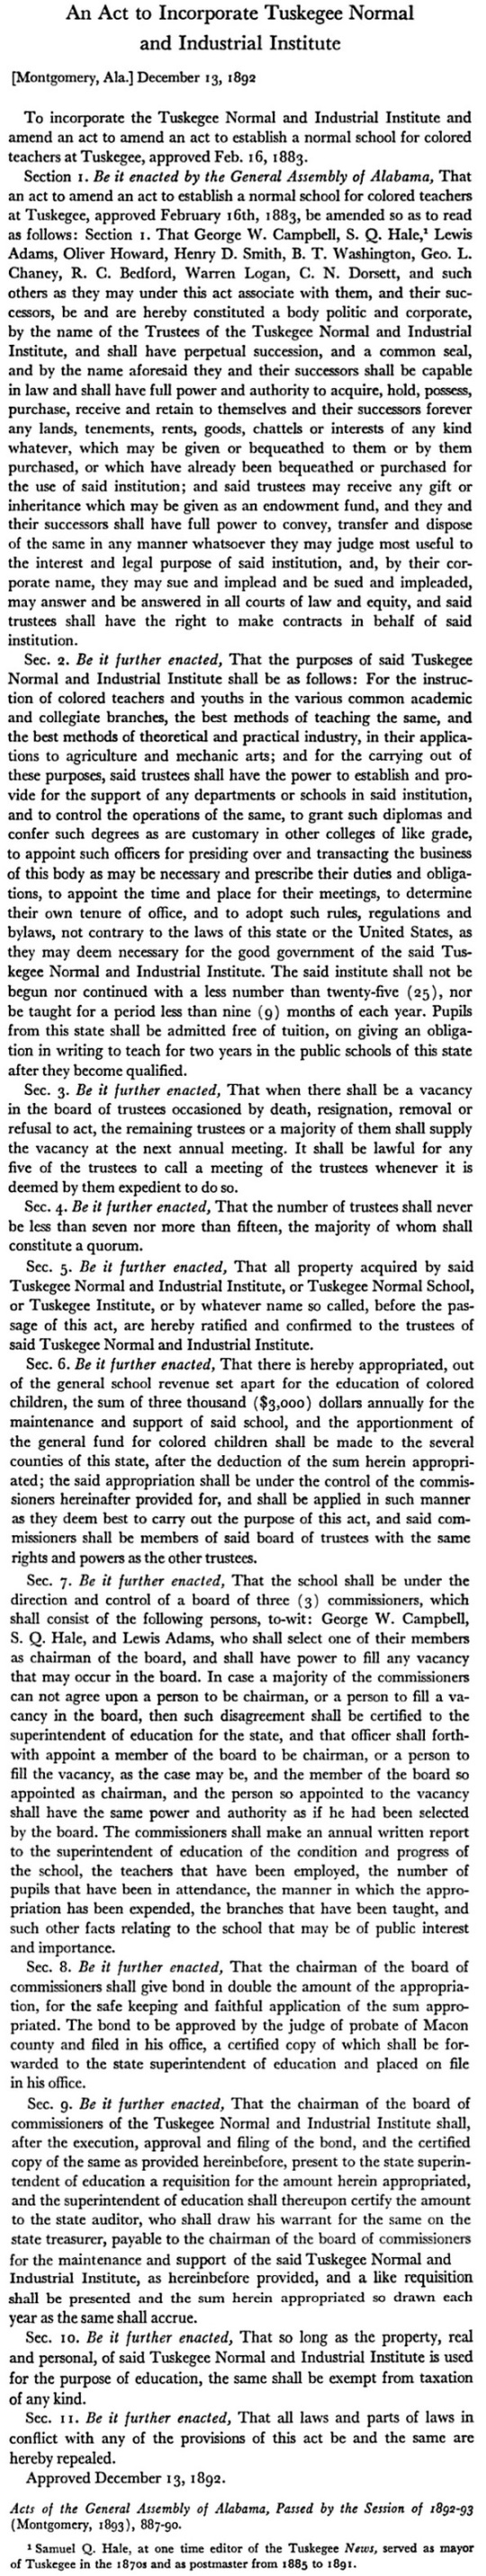 Tuskegee Charter